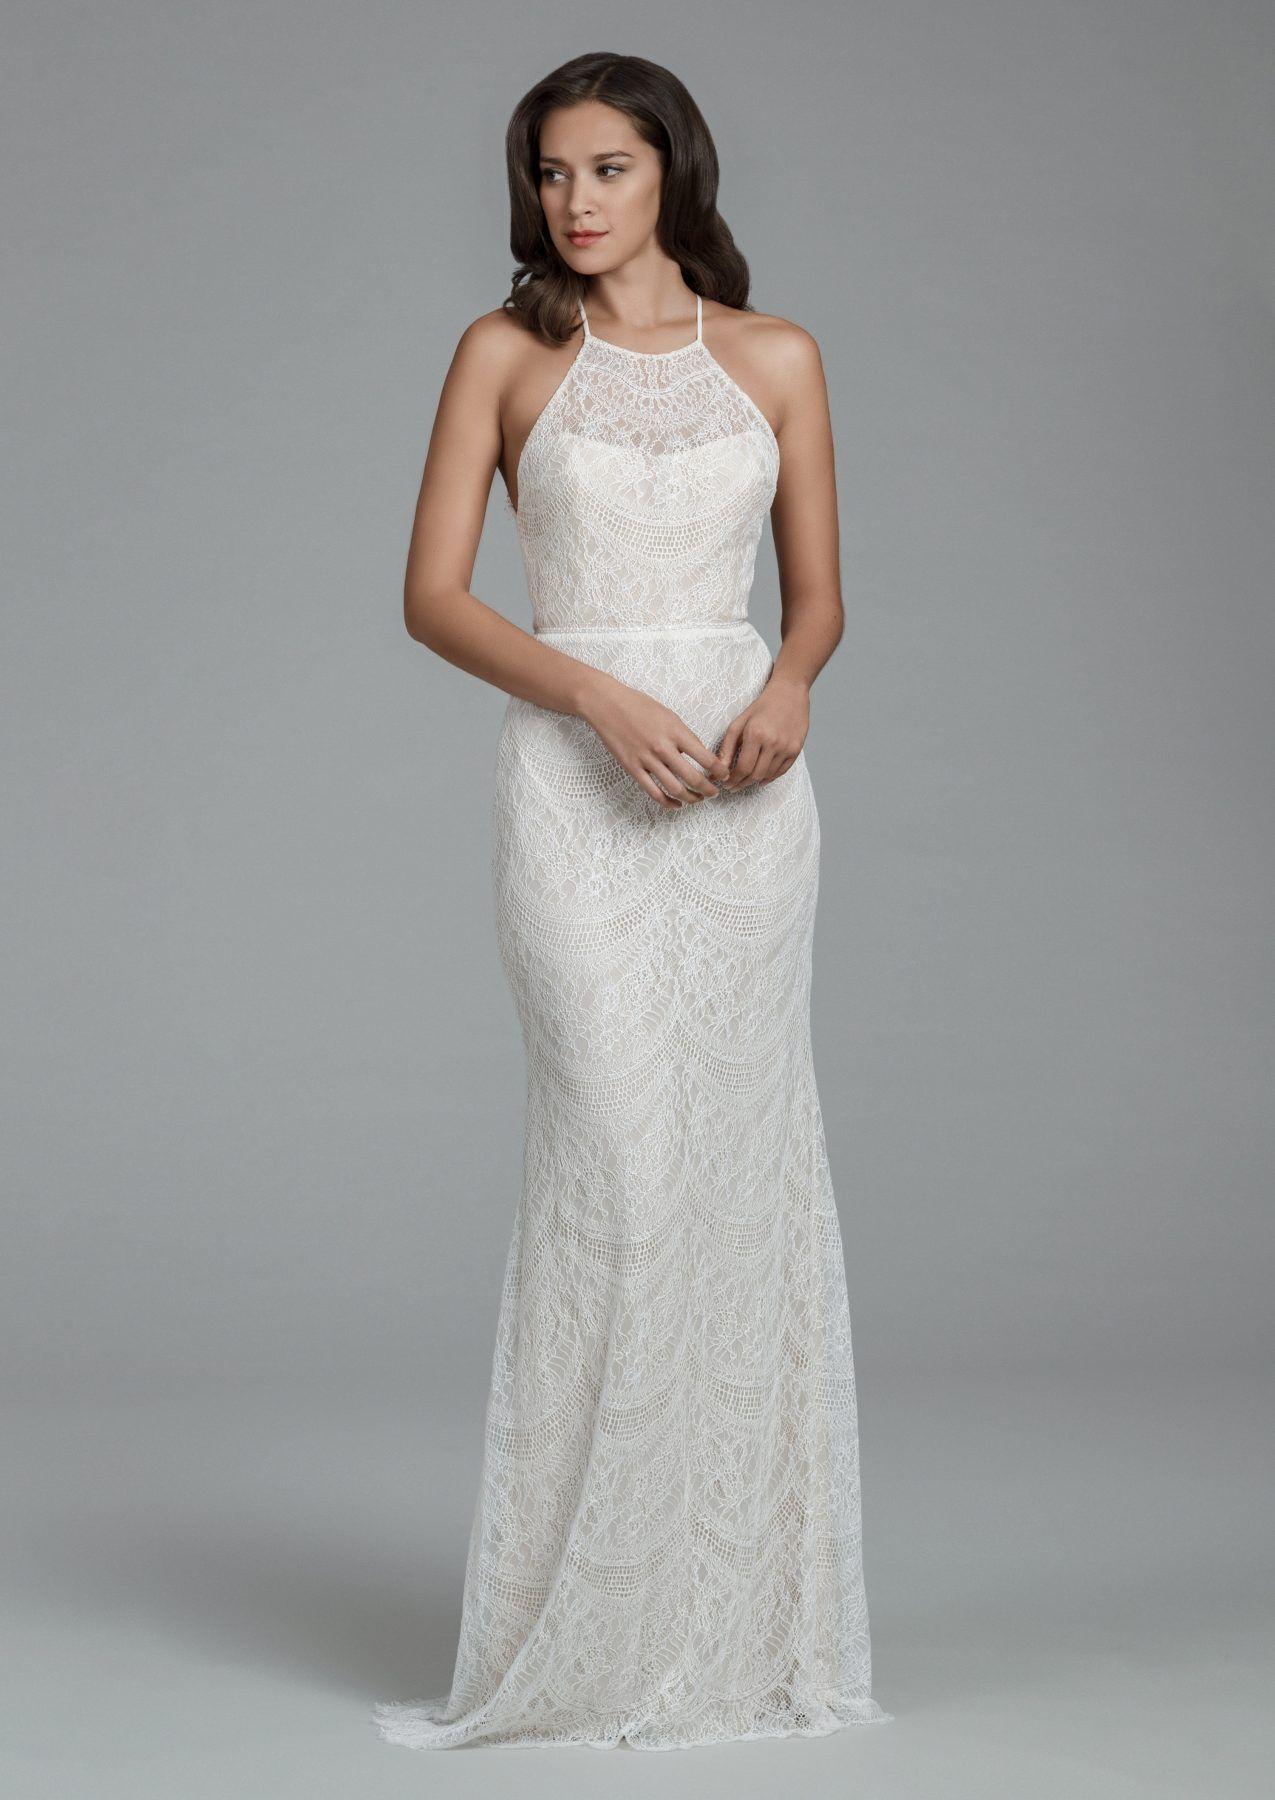 Halter style wedding dresses  Halter neckline lace sheath wedding dress  Tara Keely  Style